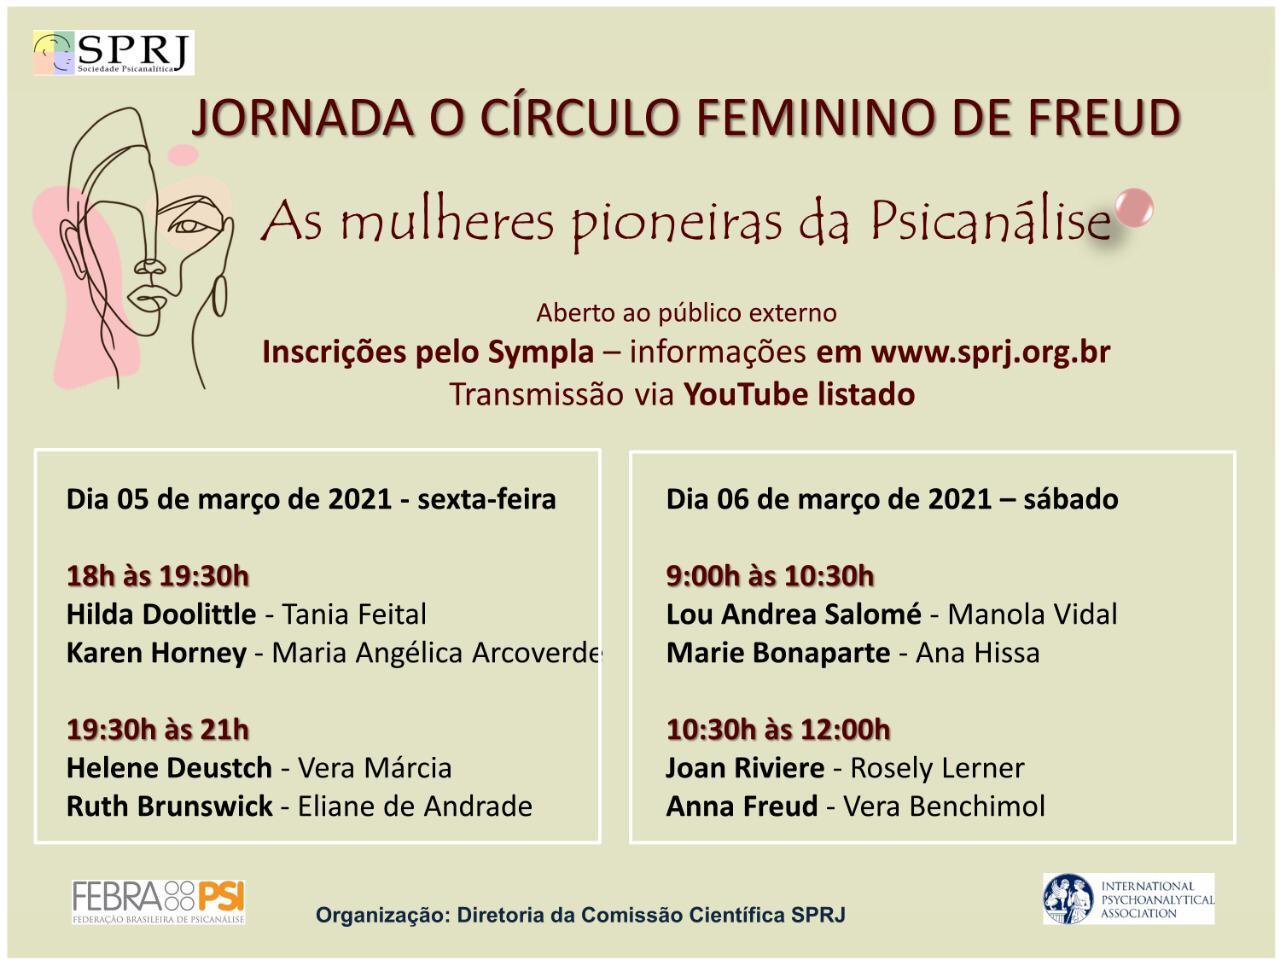 Jornada O Círculo Feminino de Freud @ on-line